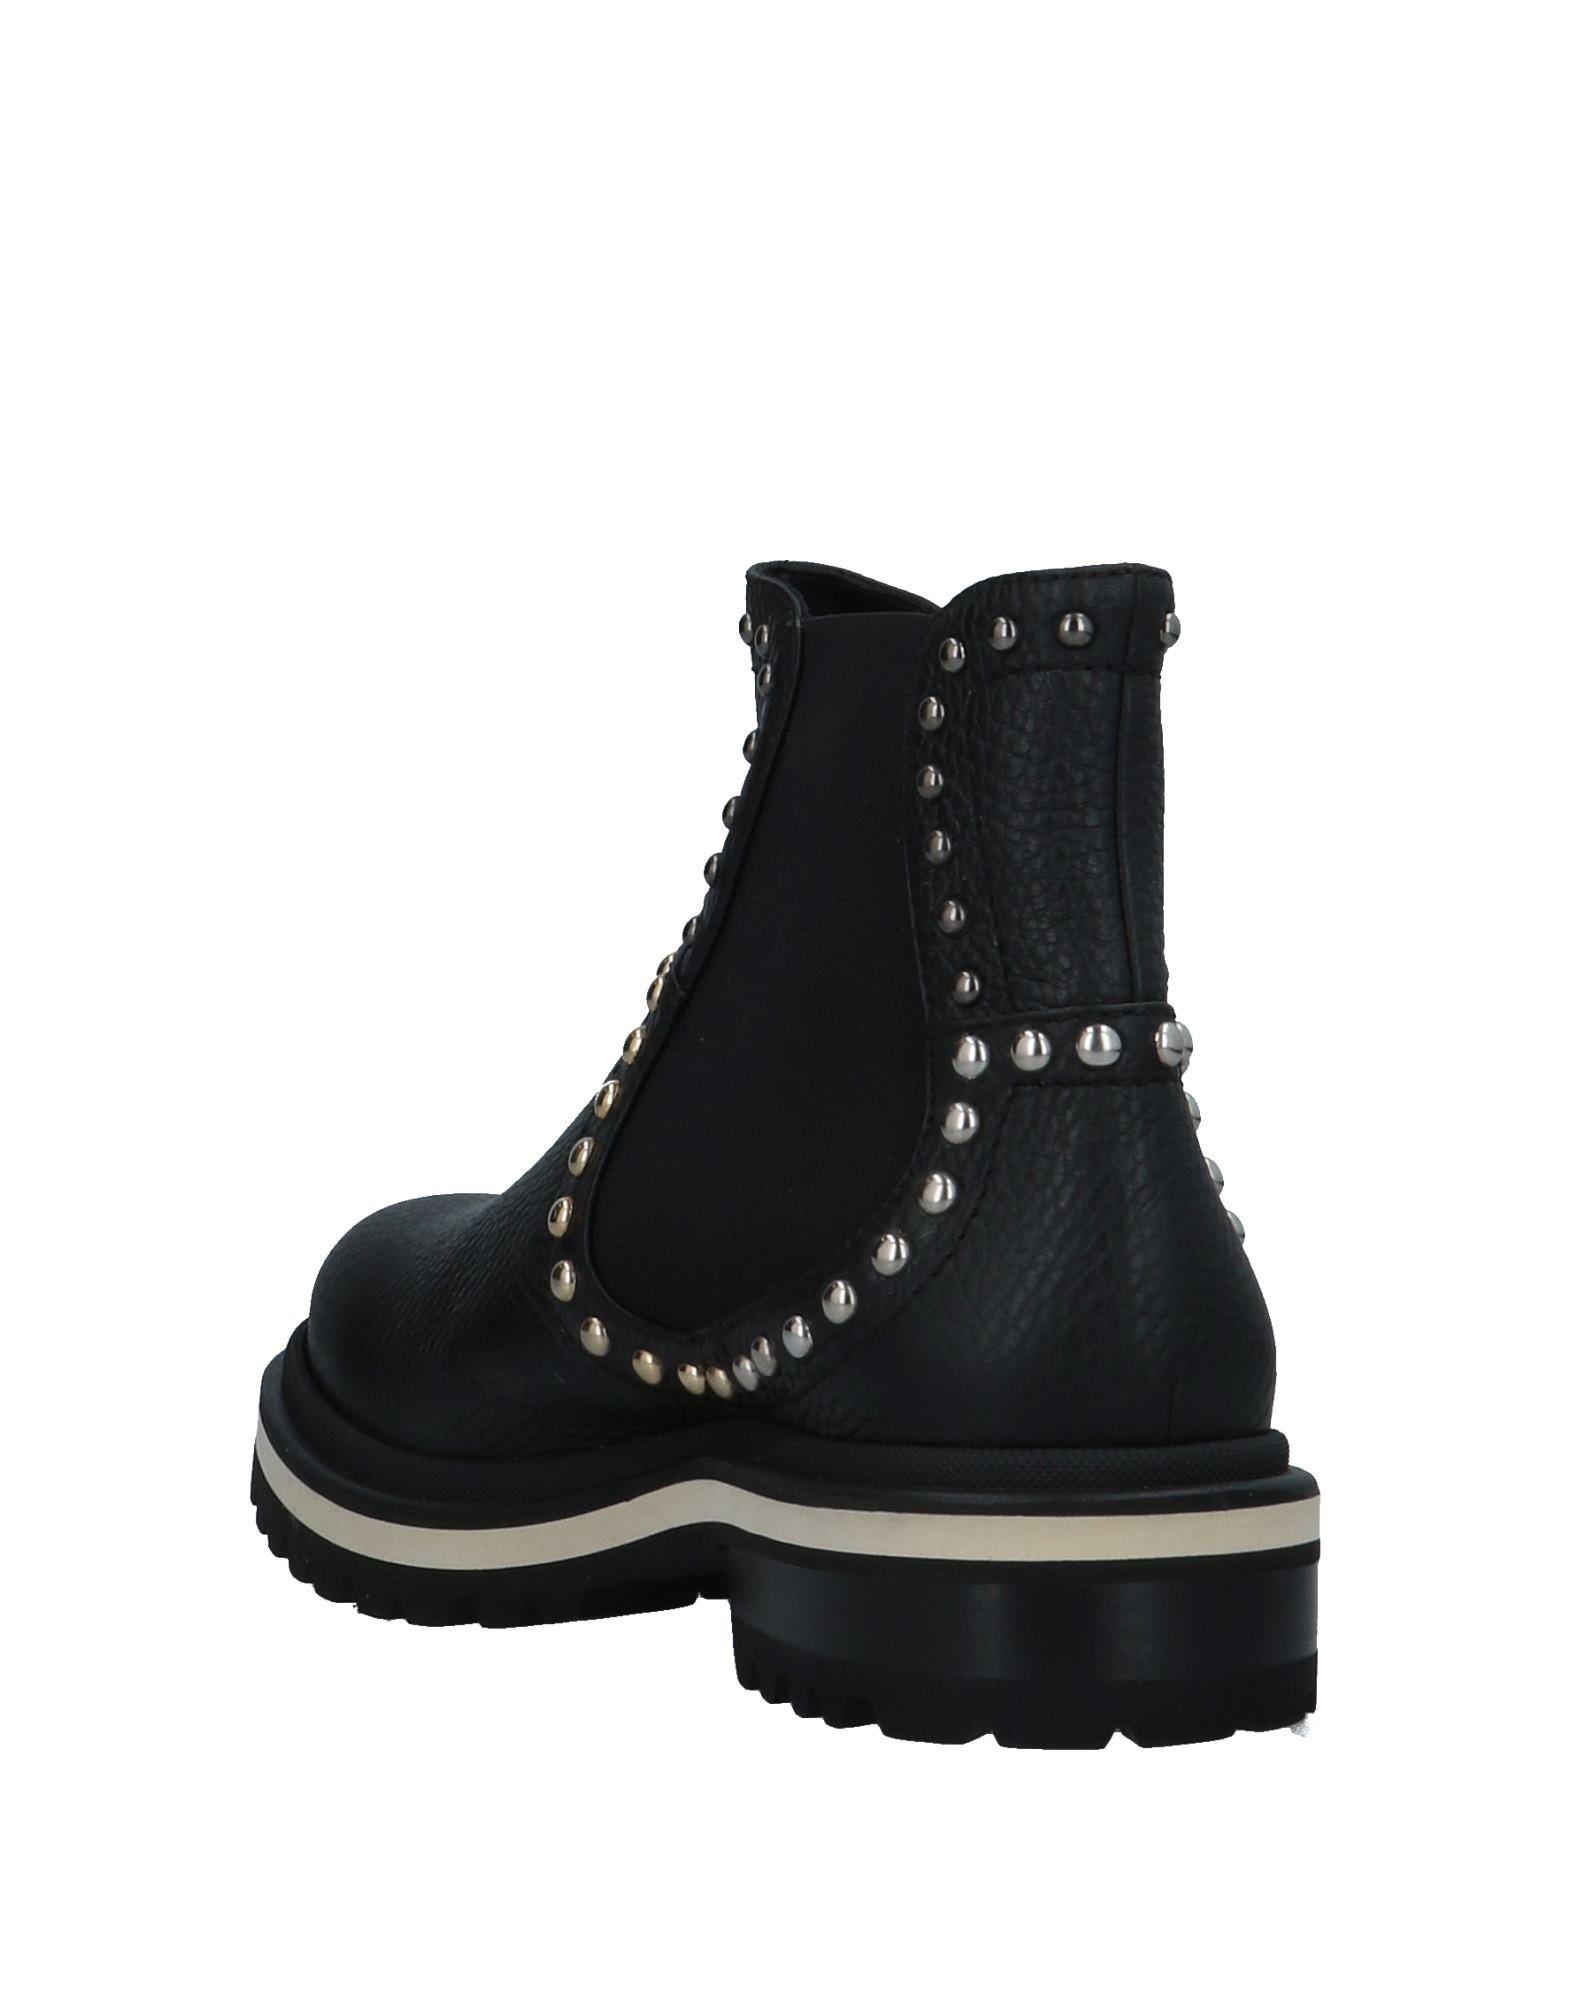 Fabi Chelsea Boots Damen  11536022WK Beliebte Beliebte Beliebte Schuhe aa5361